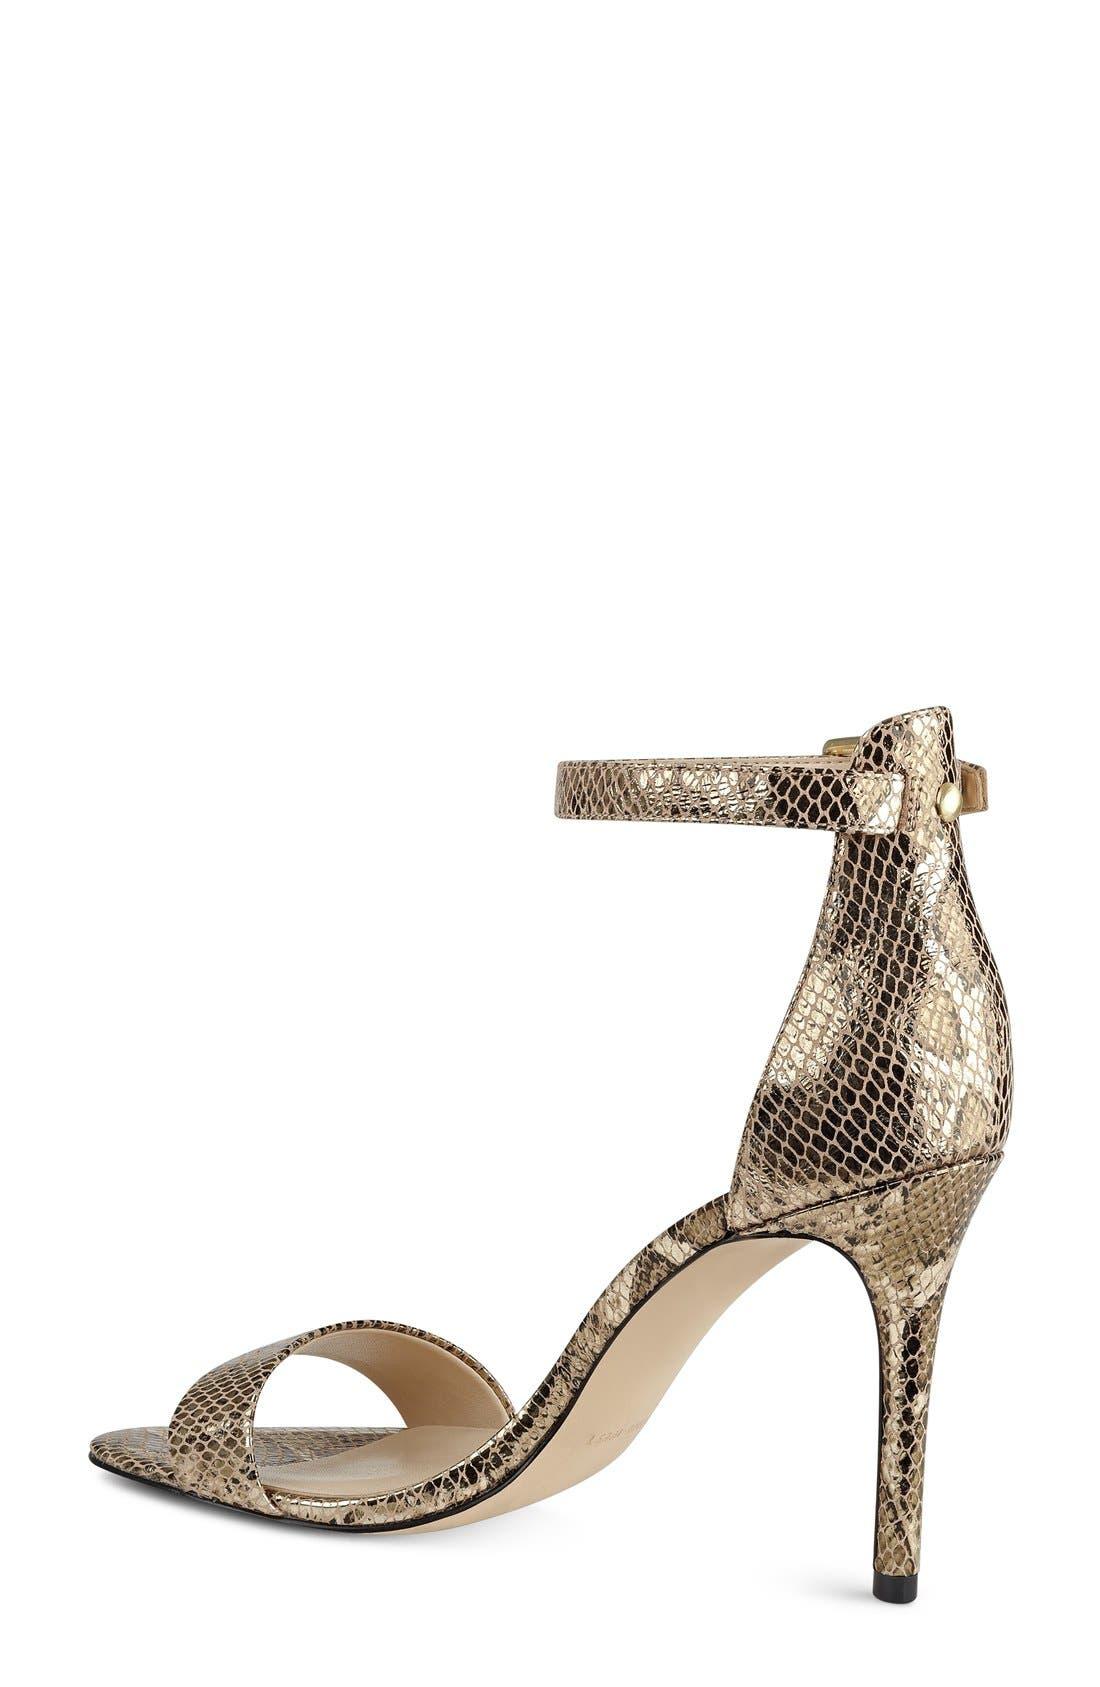 'Mana' Ankle Strap Sandal,                             Alternate thumbnail 12, color,